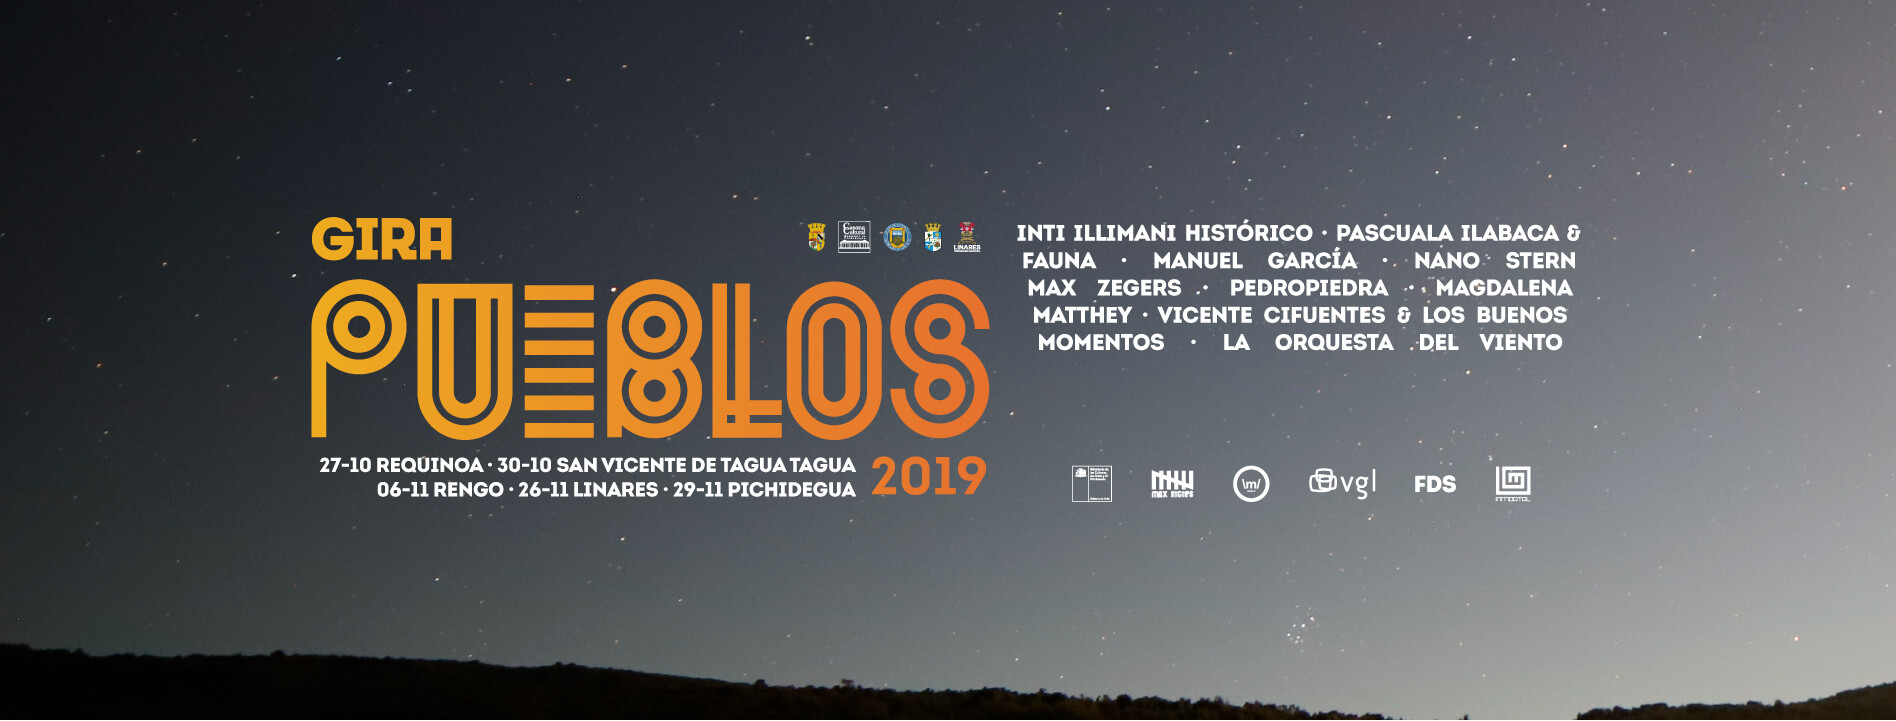 gira-pueblos_rrss_008